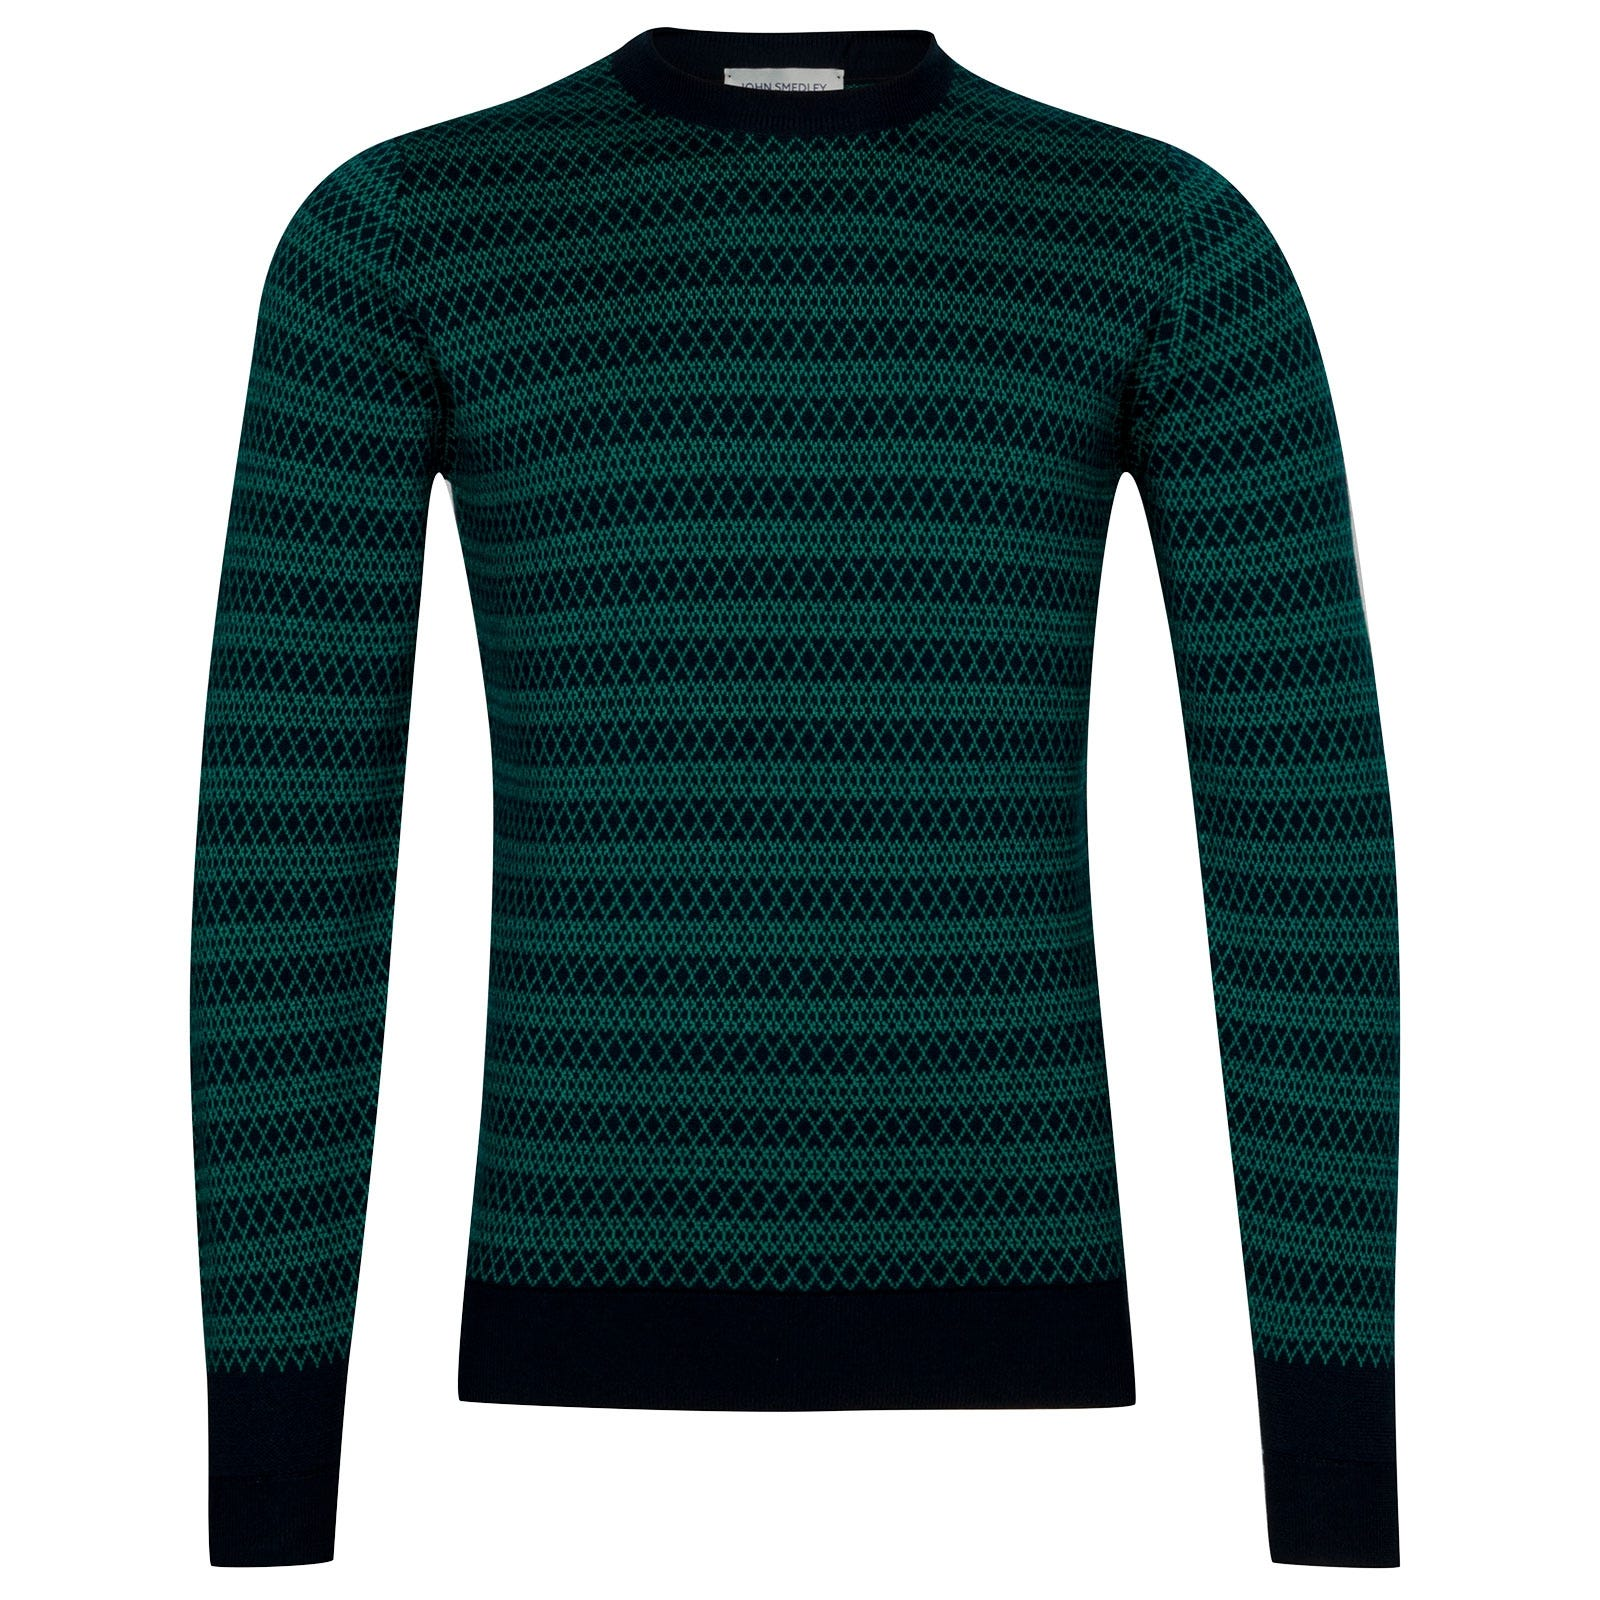 John Smedley Baldo Extra Fine Merino Wool Pullover in Orion Green-XXL